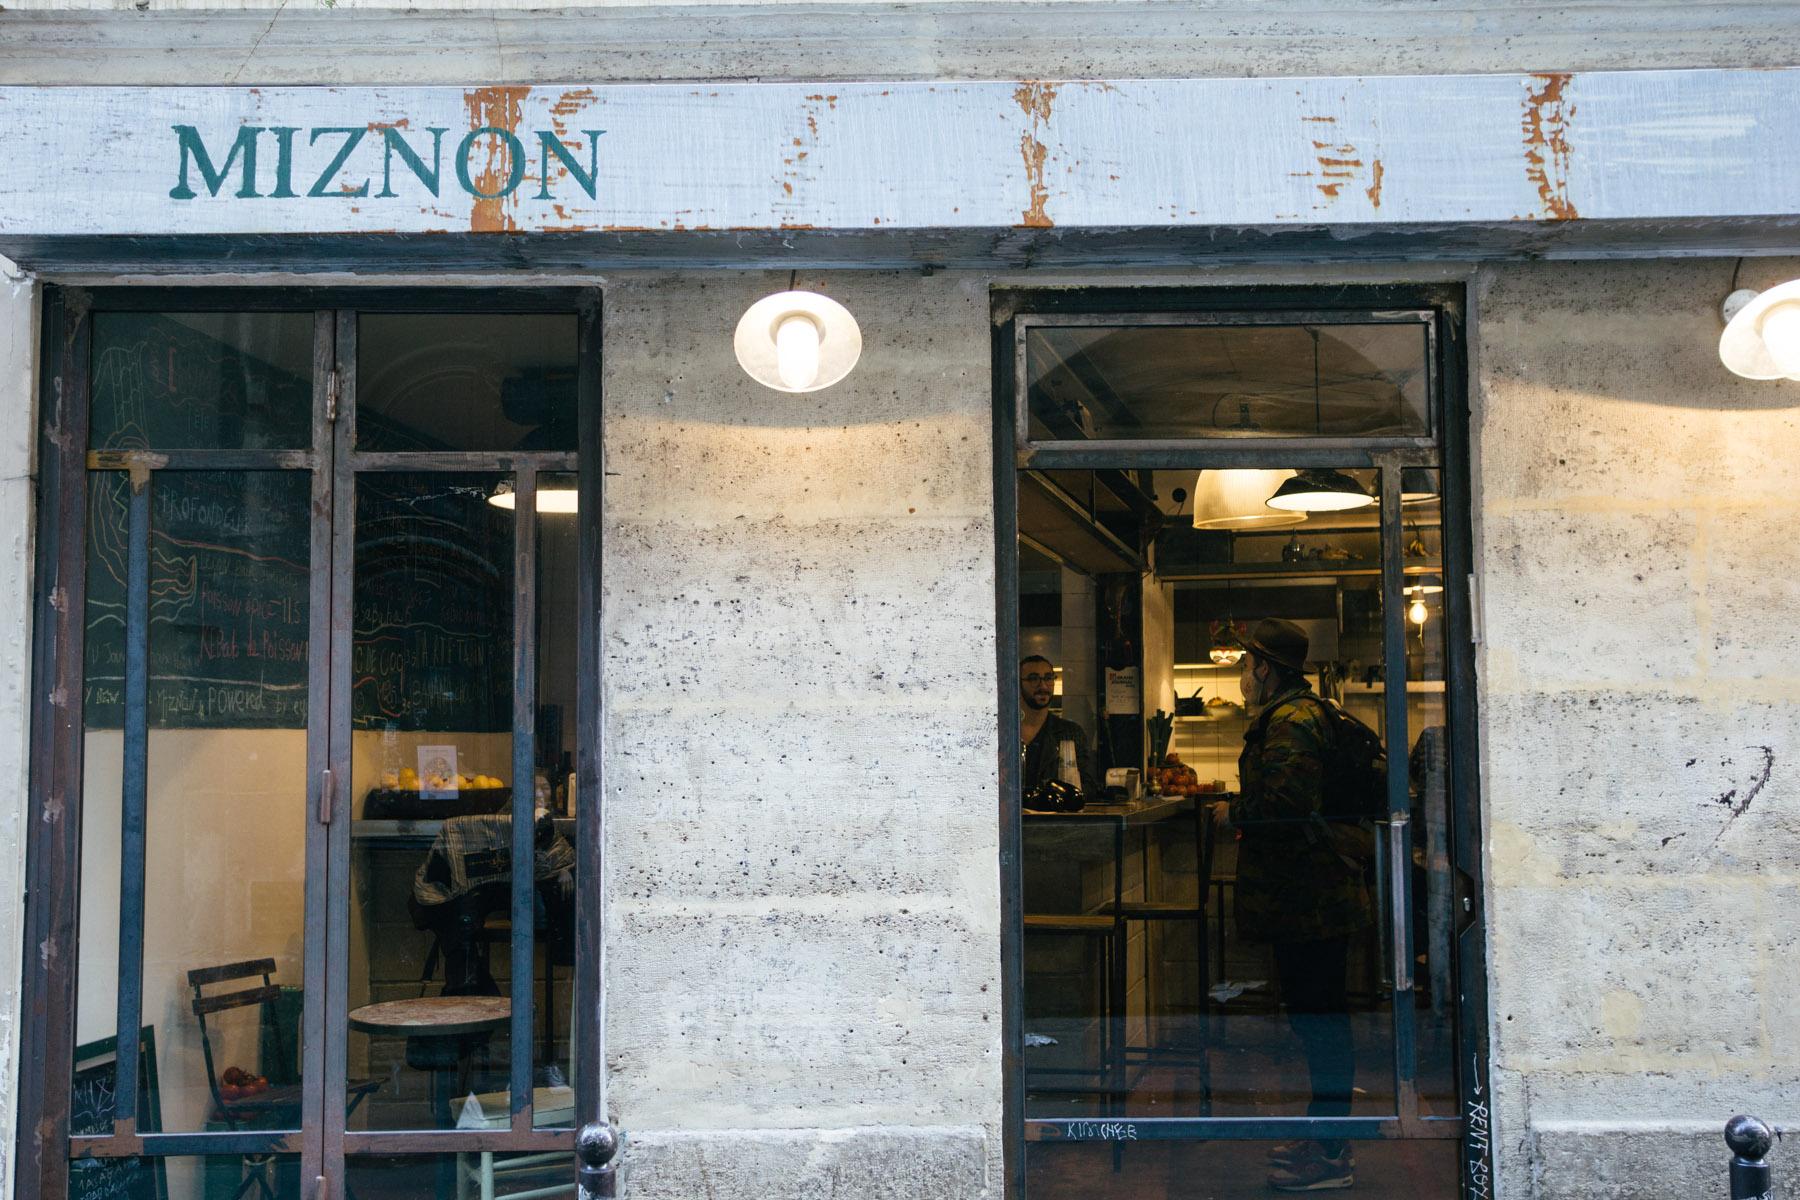 miznon-restaurant-jewish-israeli-parisian-pita-kebabs-paris-france-12